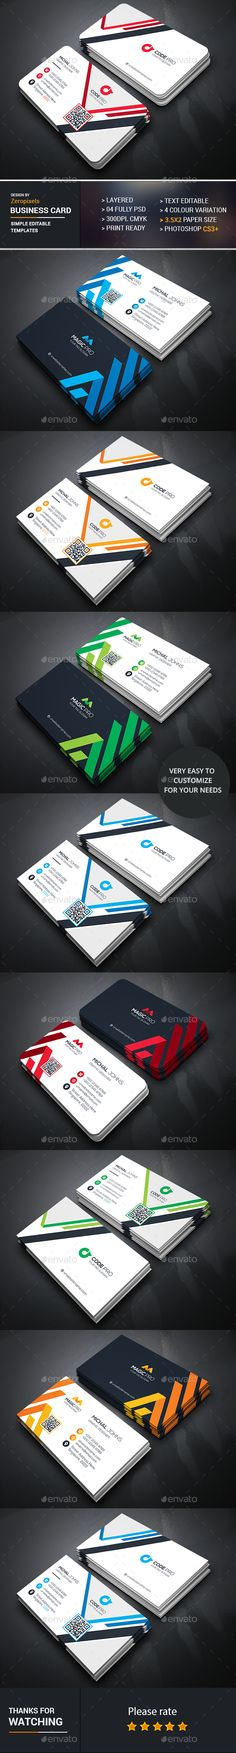 Business Card Design Bundle - Business Cards Template PSD. Download here: https://graphicriver.net/item/business-card-bundle/16939246?s_rank=190&ref=yinkira